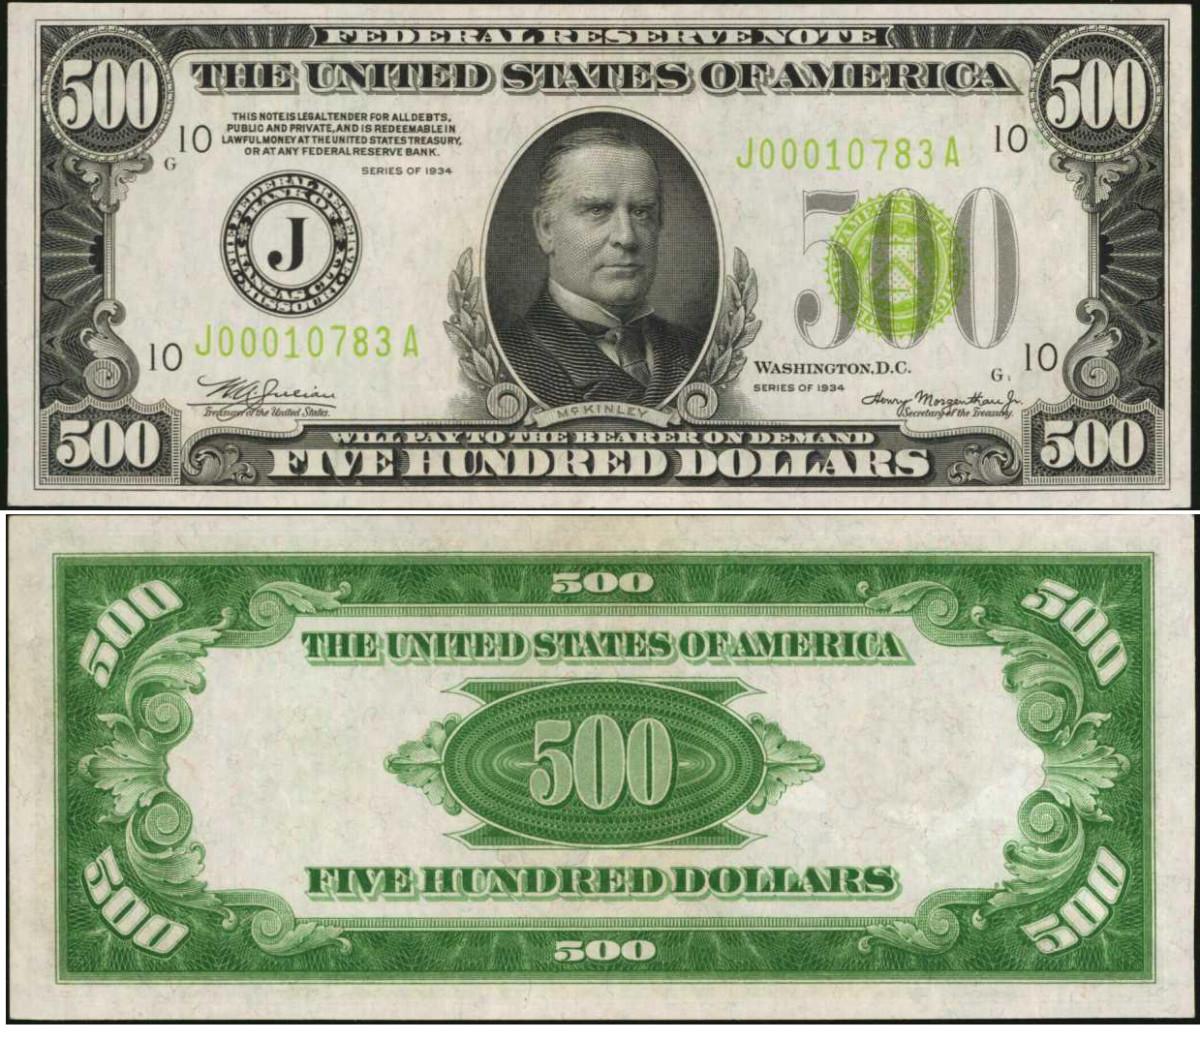 1934 $500 Federal Reserve Note. Kansas City. PMG Gem Uncirculated 66 EPQ.